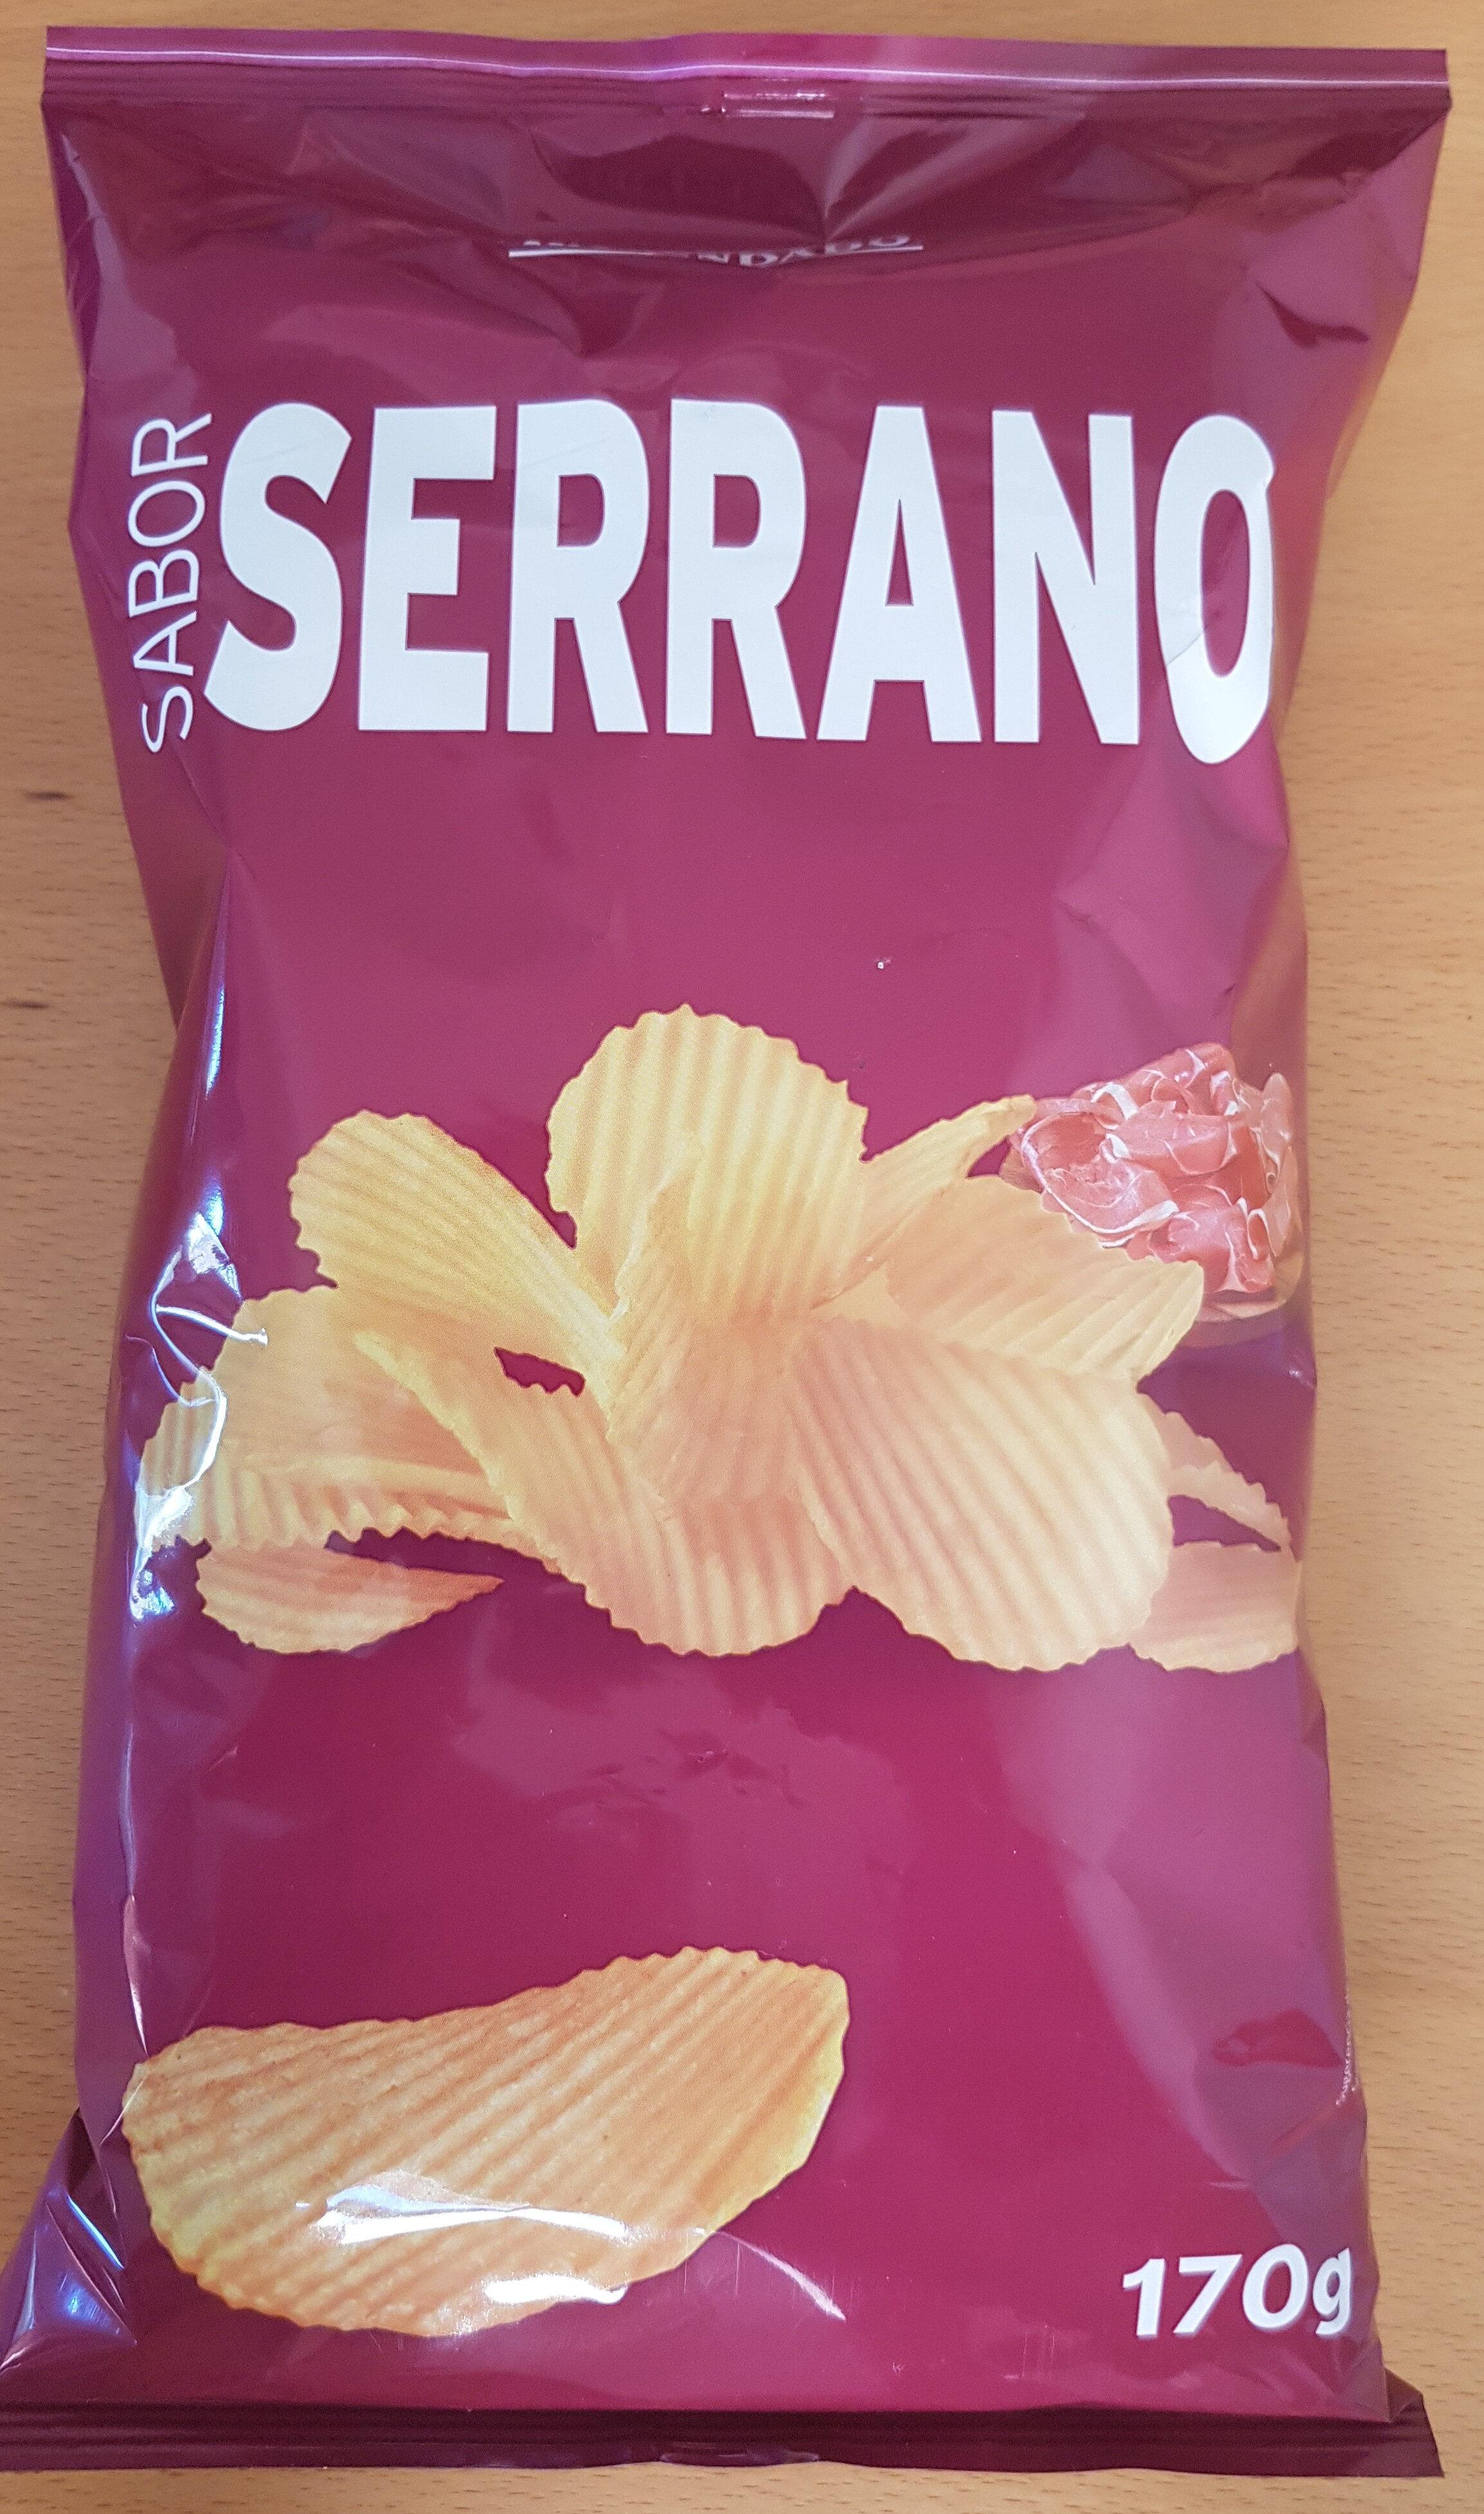 Patatas fritas sabor serrano - Produit